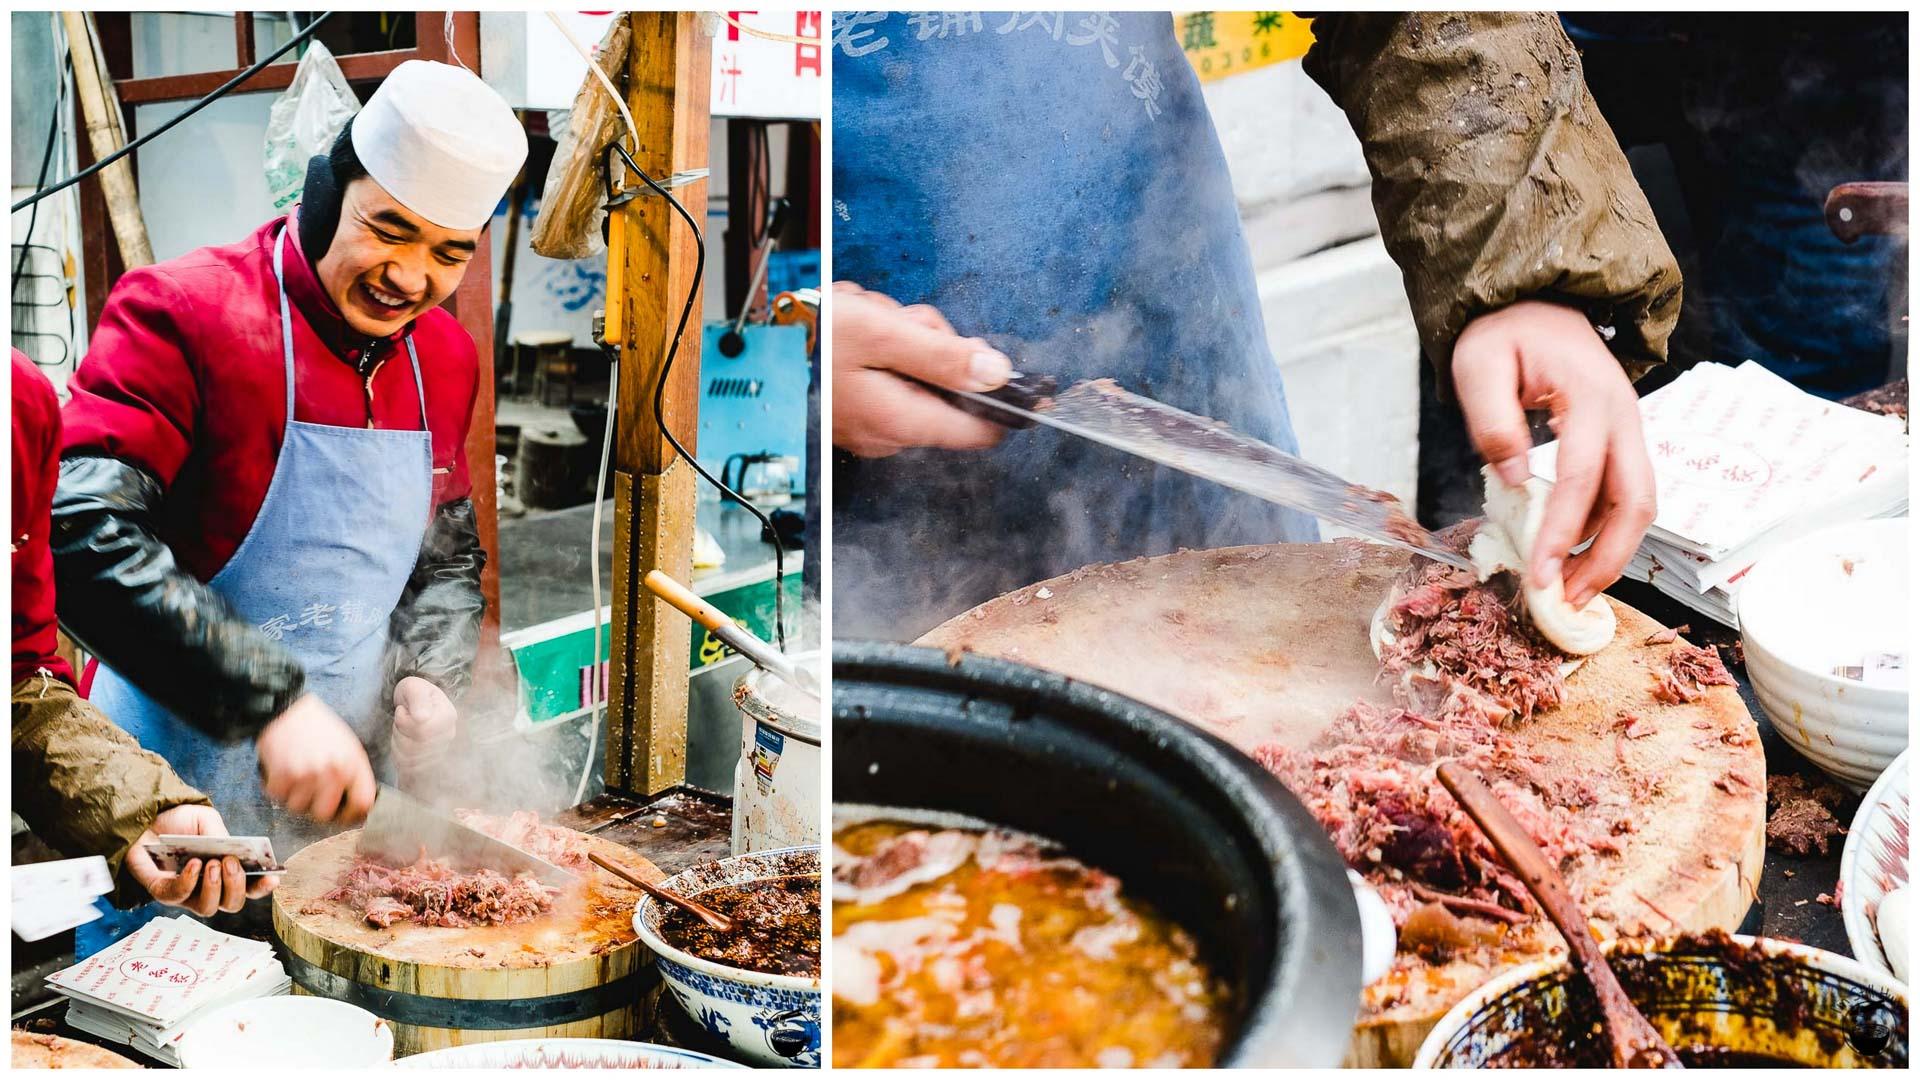 肉夹馍 (rou jia mo) Hui Min Jie Xi'an Muslim Street Food